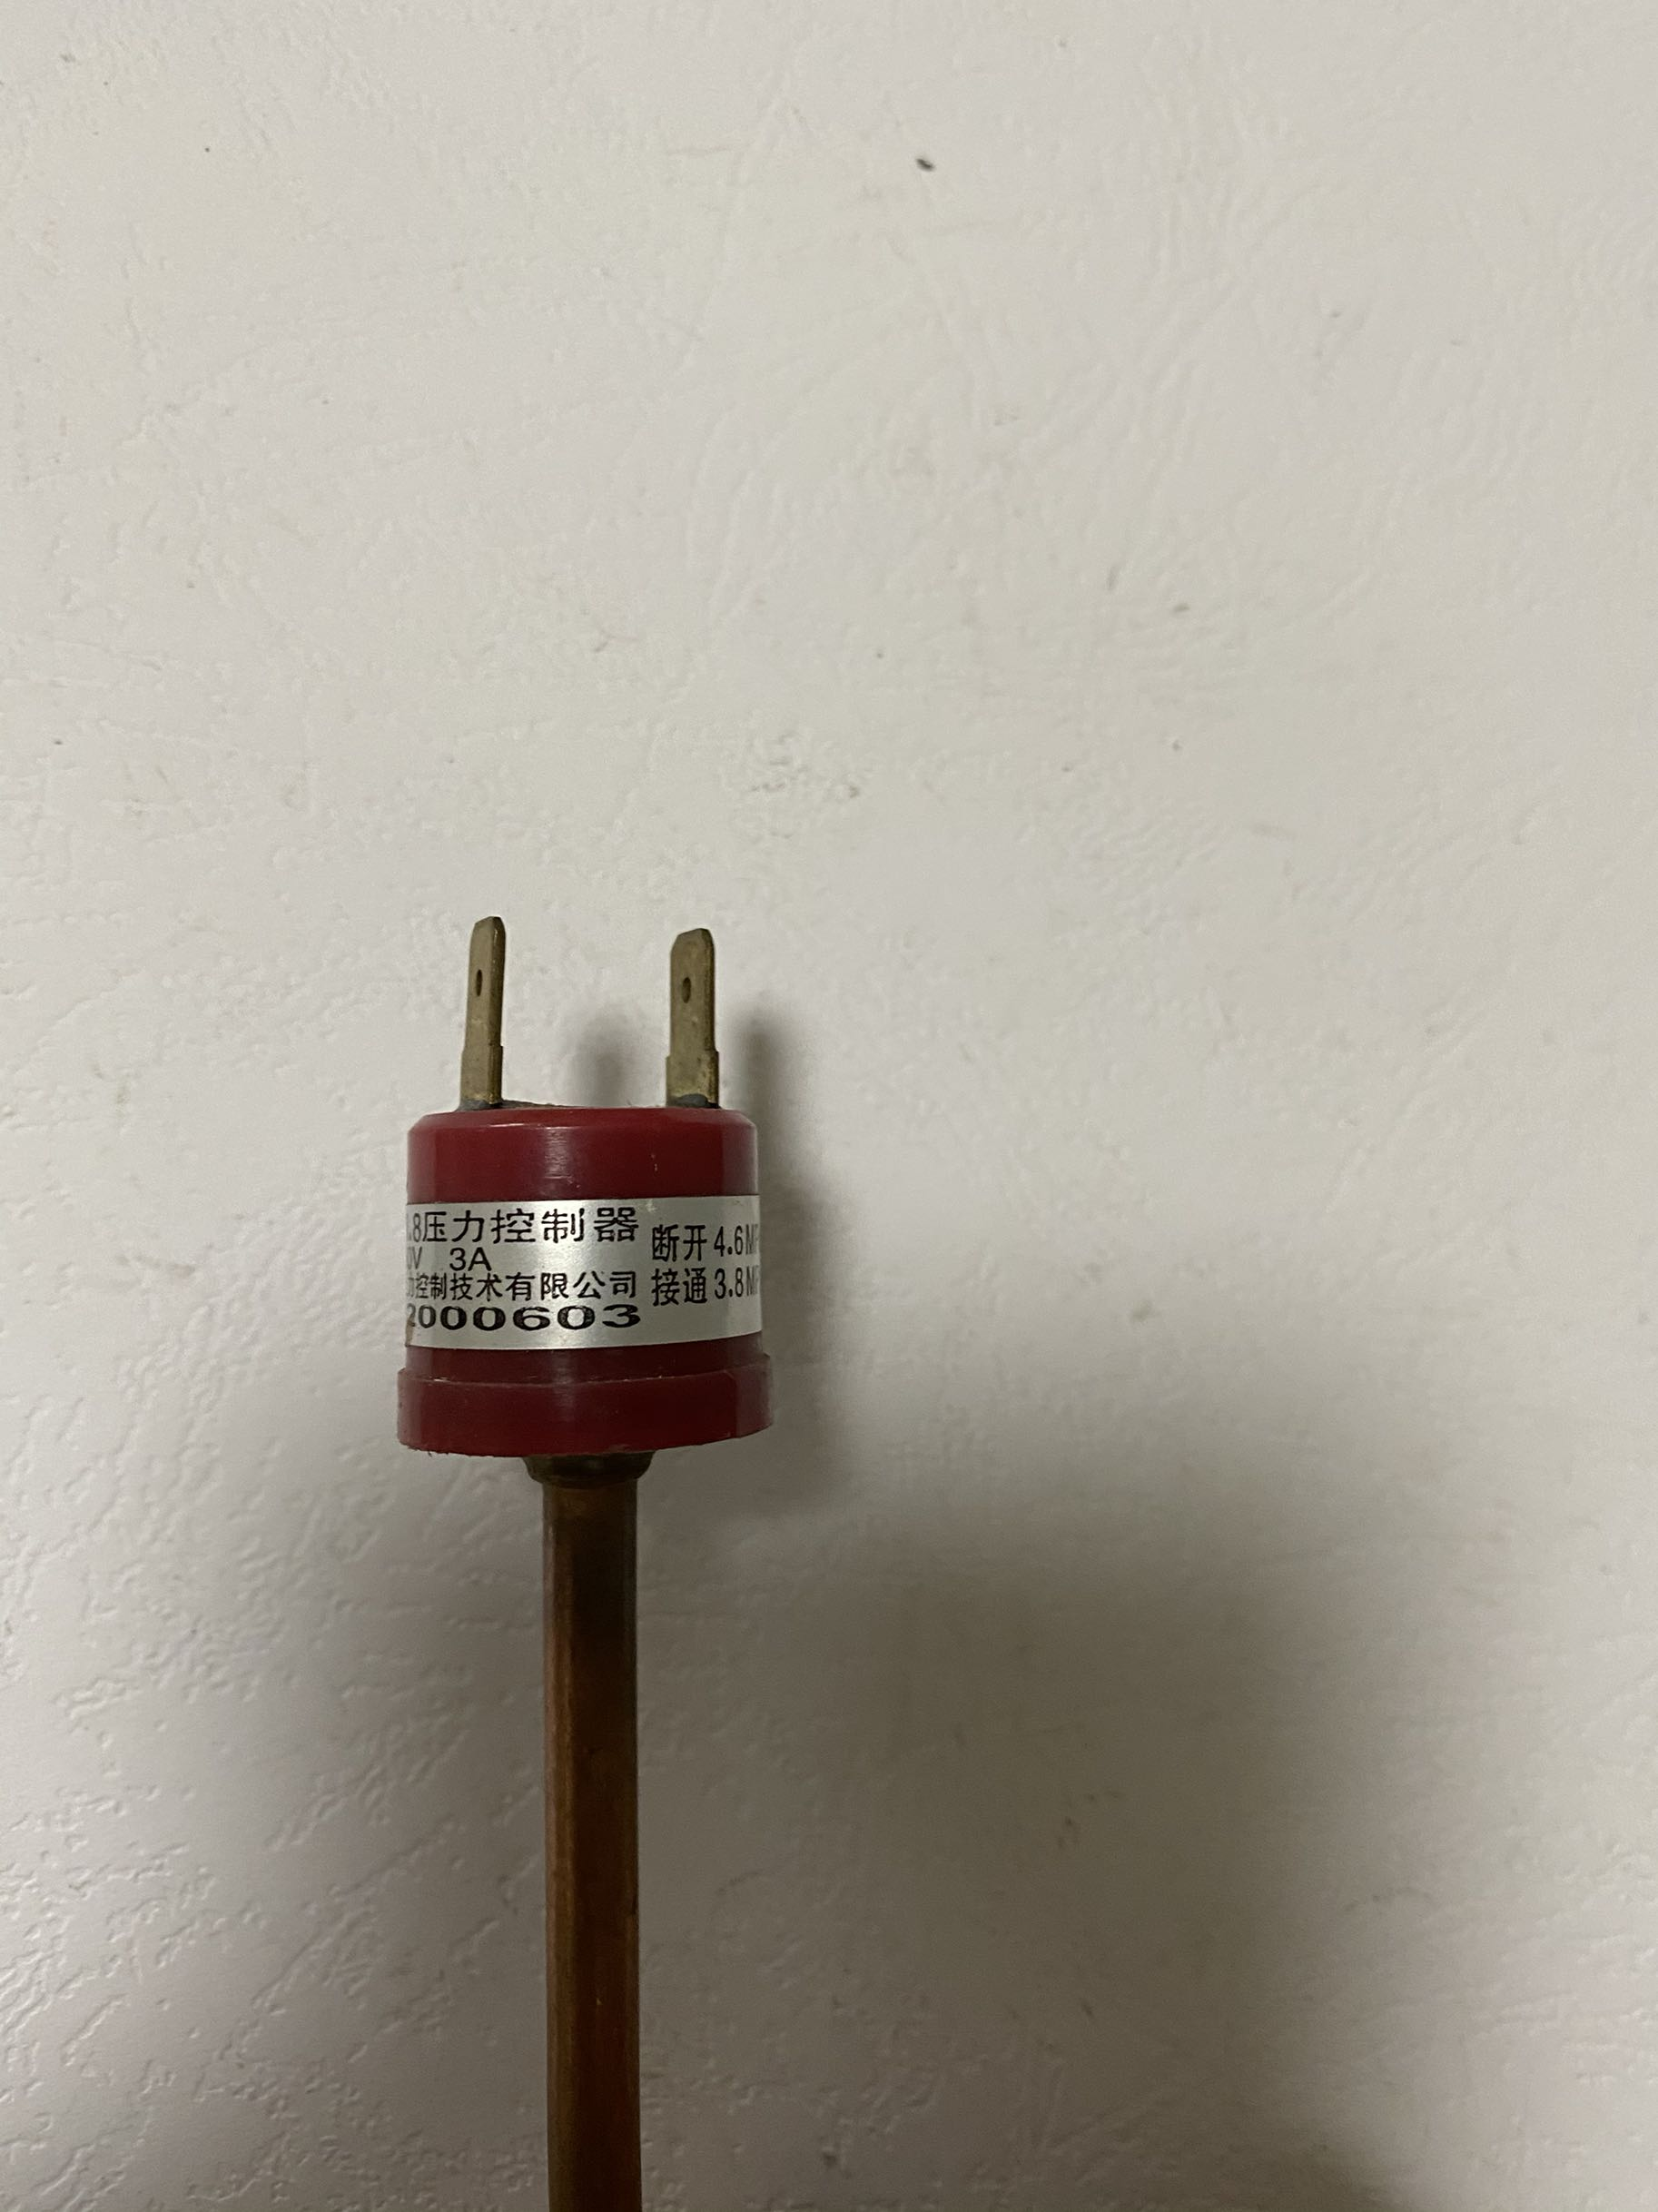 YK-4.6/3.8 تحكم الضغط قبالة 4.6Mpa على 3.8Mpa 250 فولت 3A حقيقية